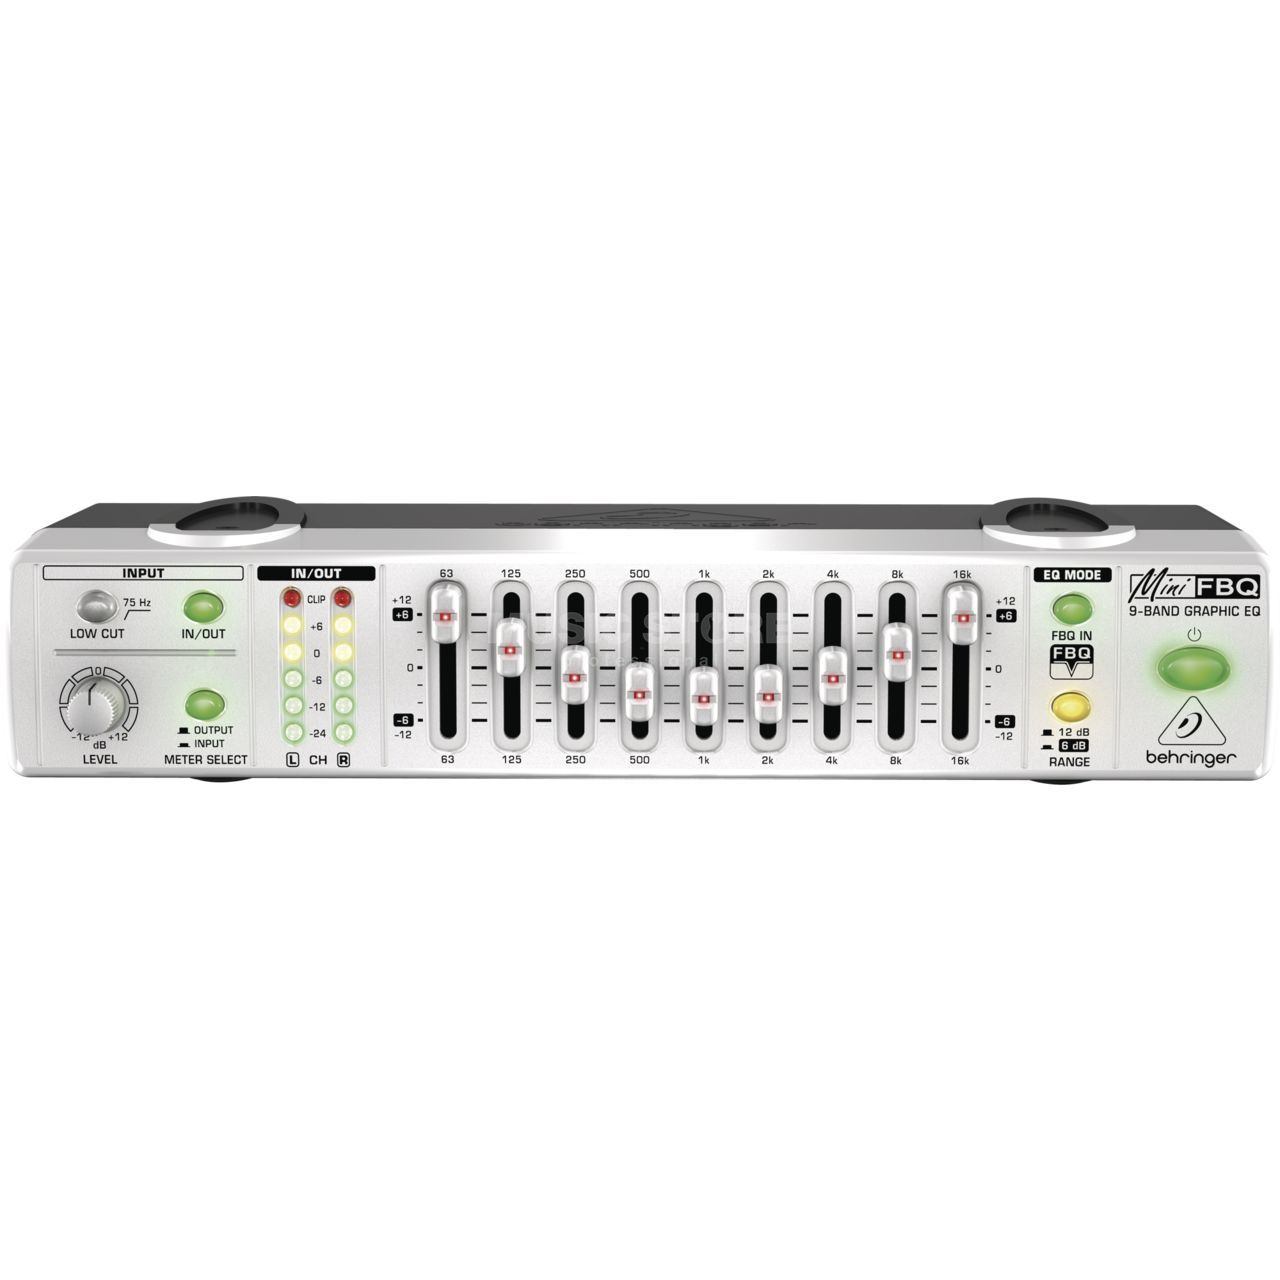 Behringer MINIFBQ FBQ800 Ultra-Compact Graphic Equalizer   MUSIC STORE  professional   en-DE